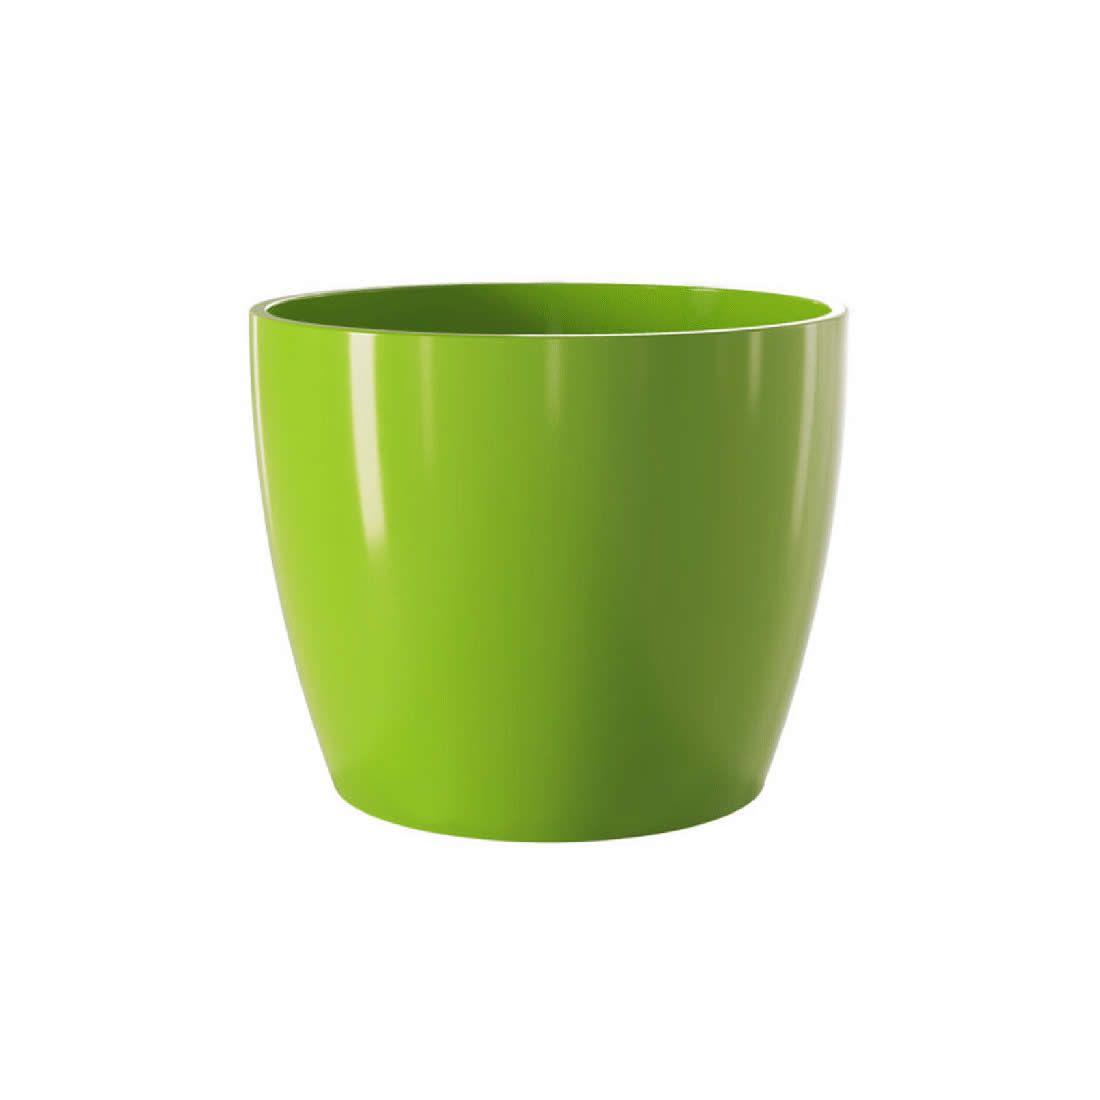 Vaso Para Planta Cerâmico Munique Verde 16 - Japi